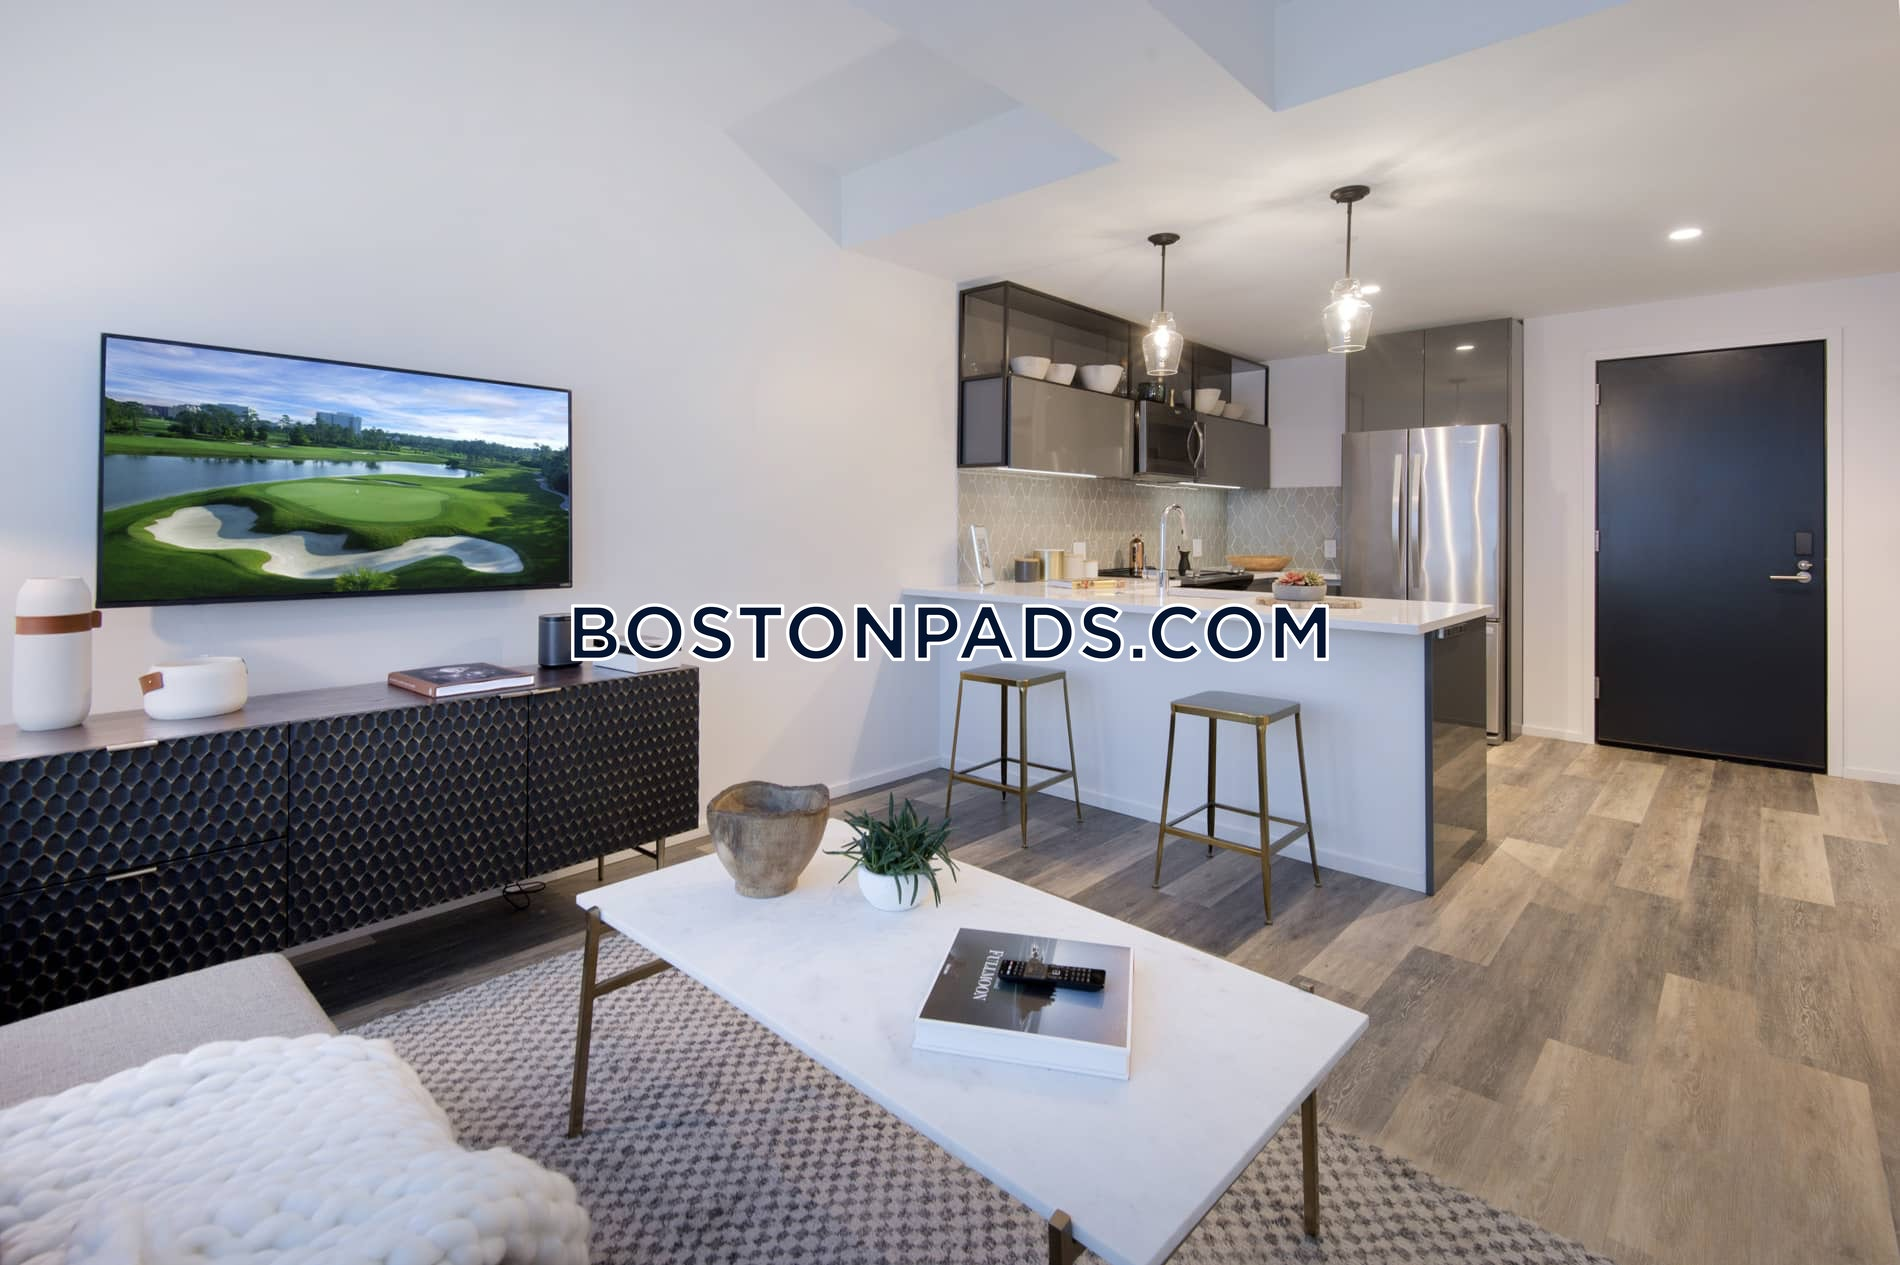 Pet Friendly Apartments South End Apartment For Rent 3 Bedrooms 2 5 Baths Boston 6 099